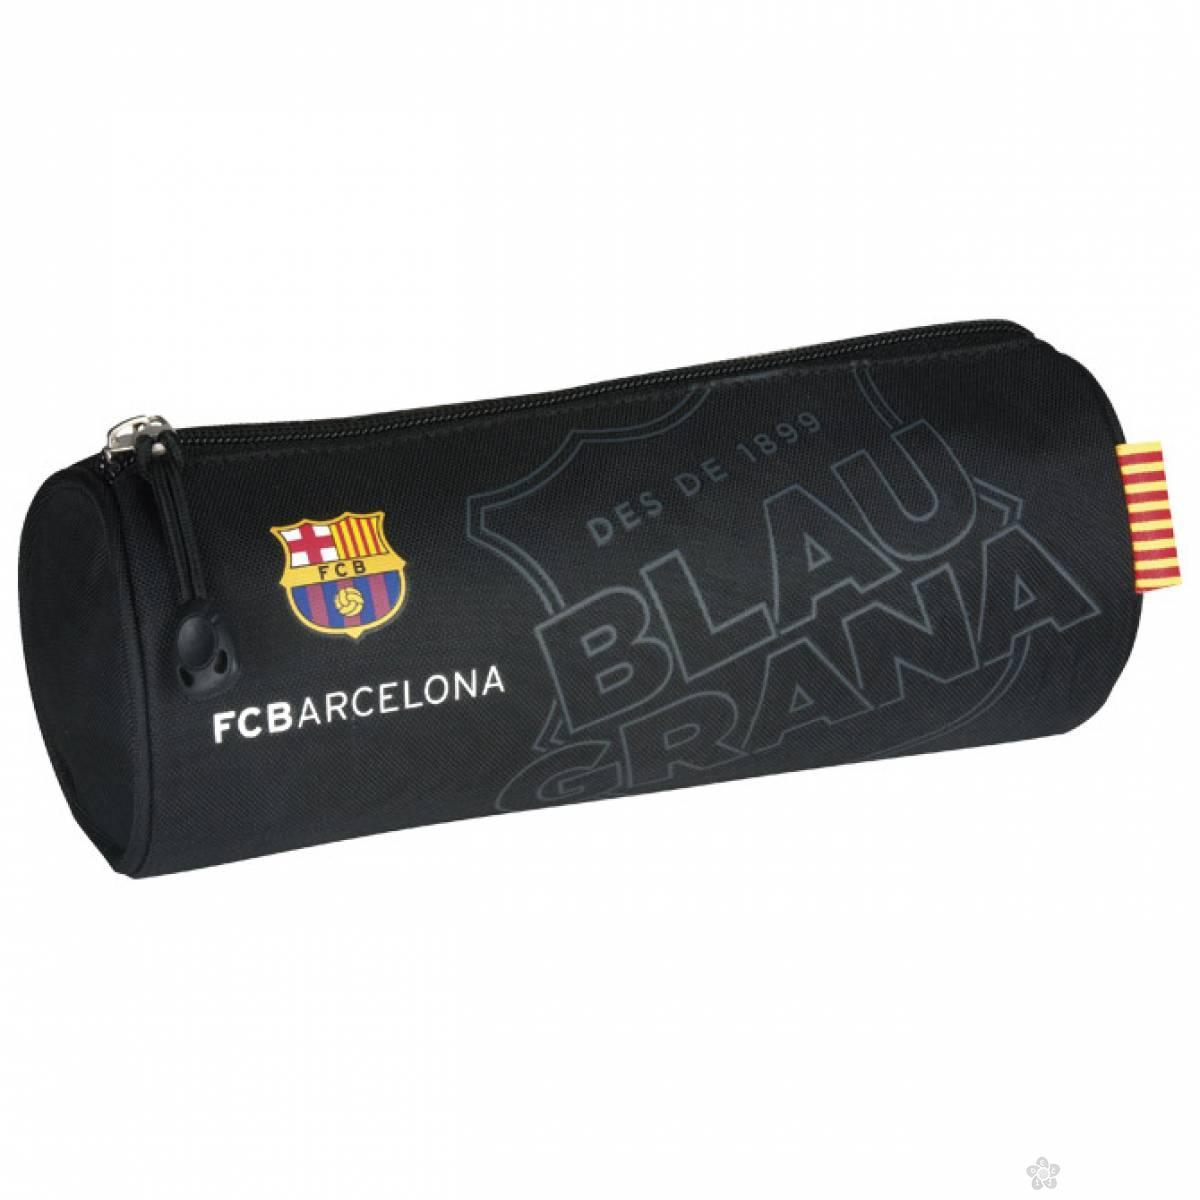 Okrugla pernica FC Barcelona 1 zip Astra 505016046